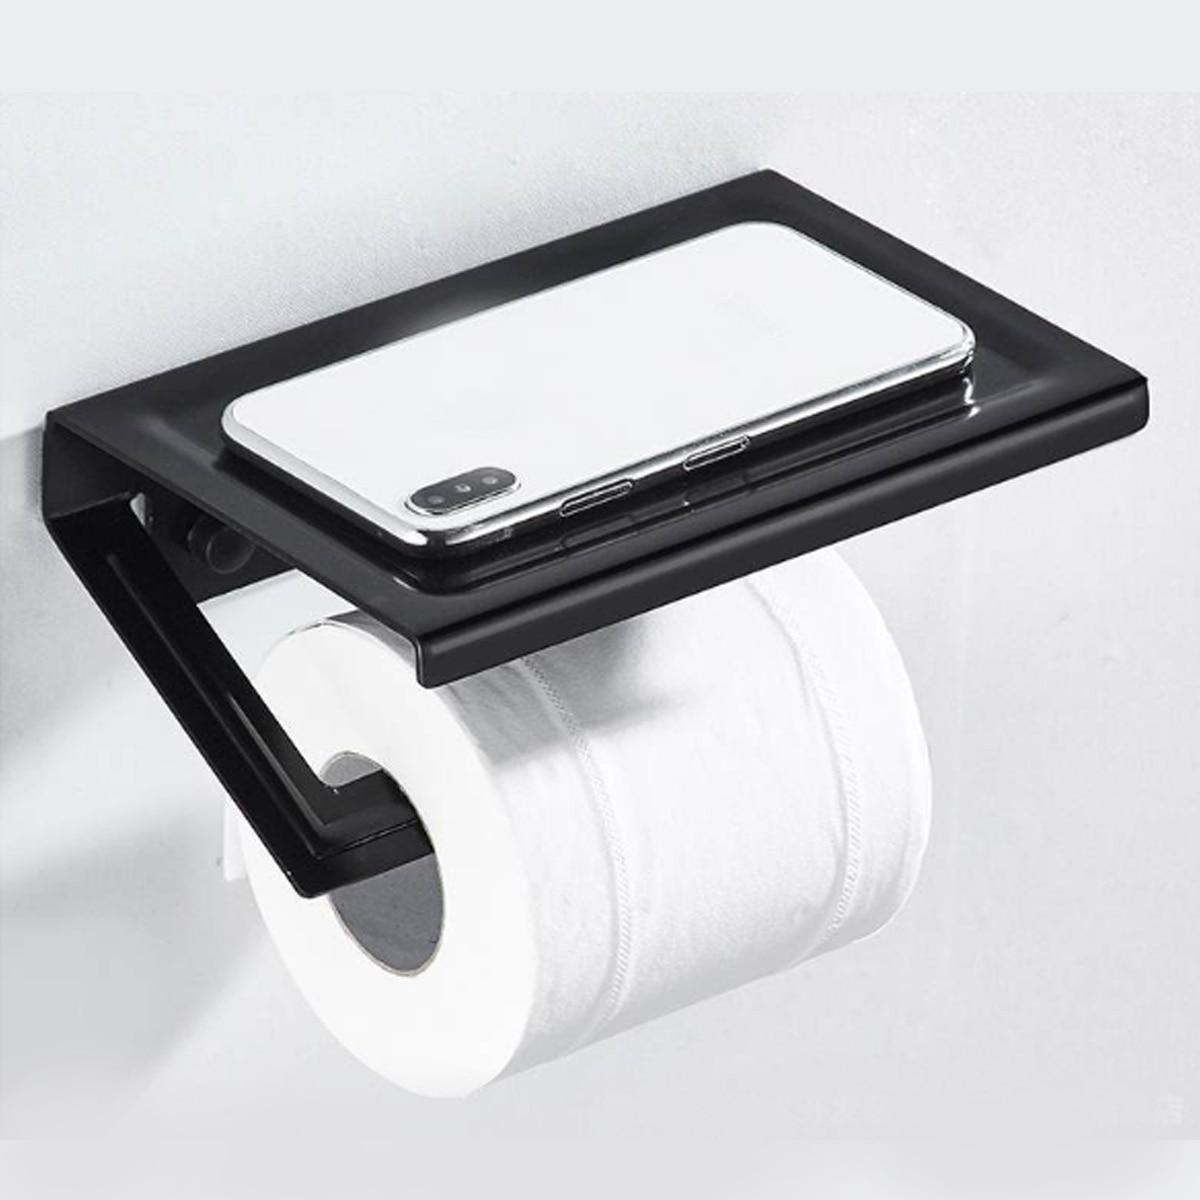 Bathroom Shelves Space Aluminum Toilet Paper Holder Bathroom Hotel Roll Paper Tissue Hanging Rack Shelf With Phone Holder